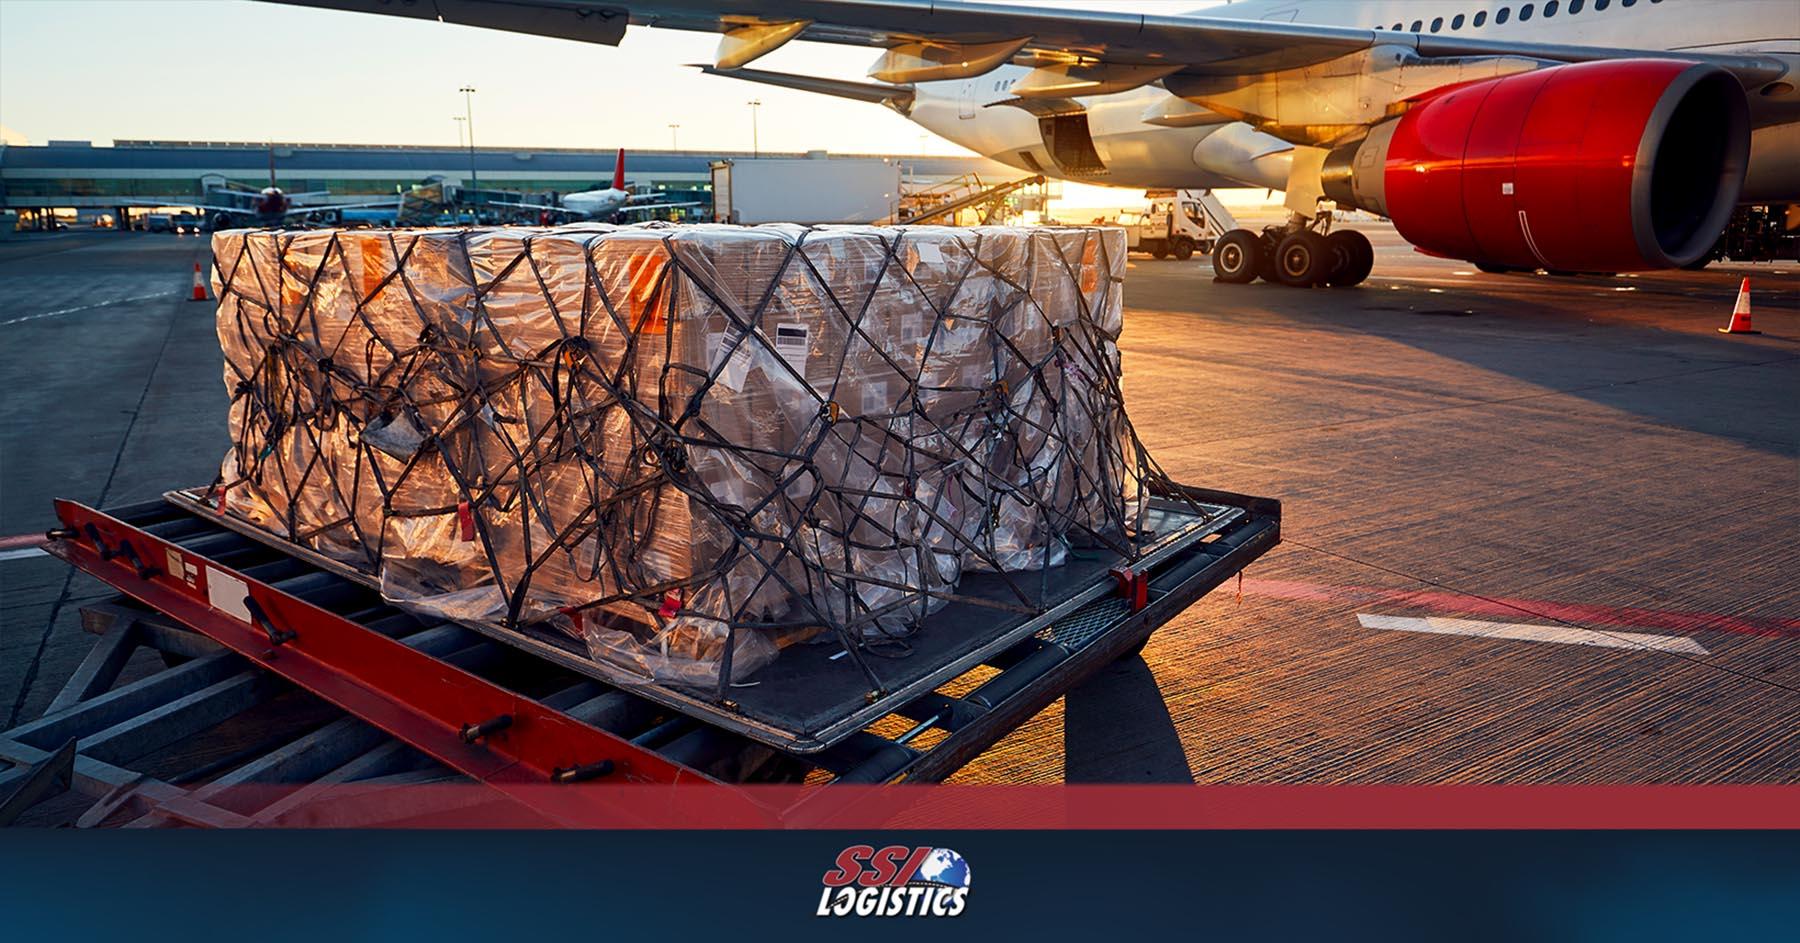 SSI Logistics expedited shipping image i